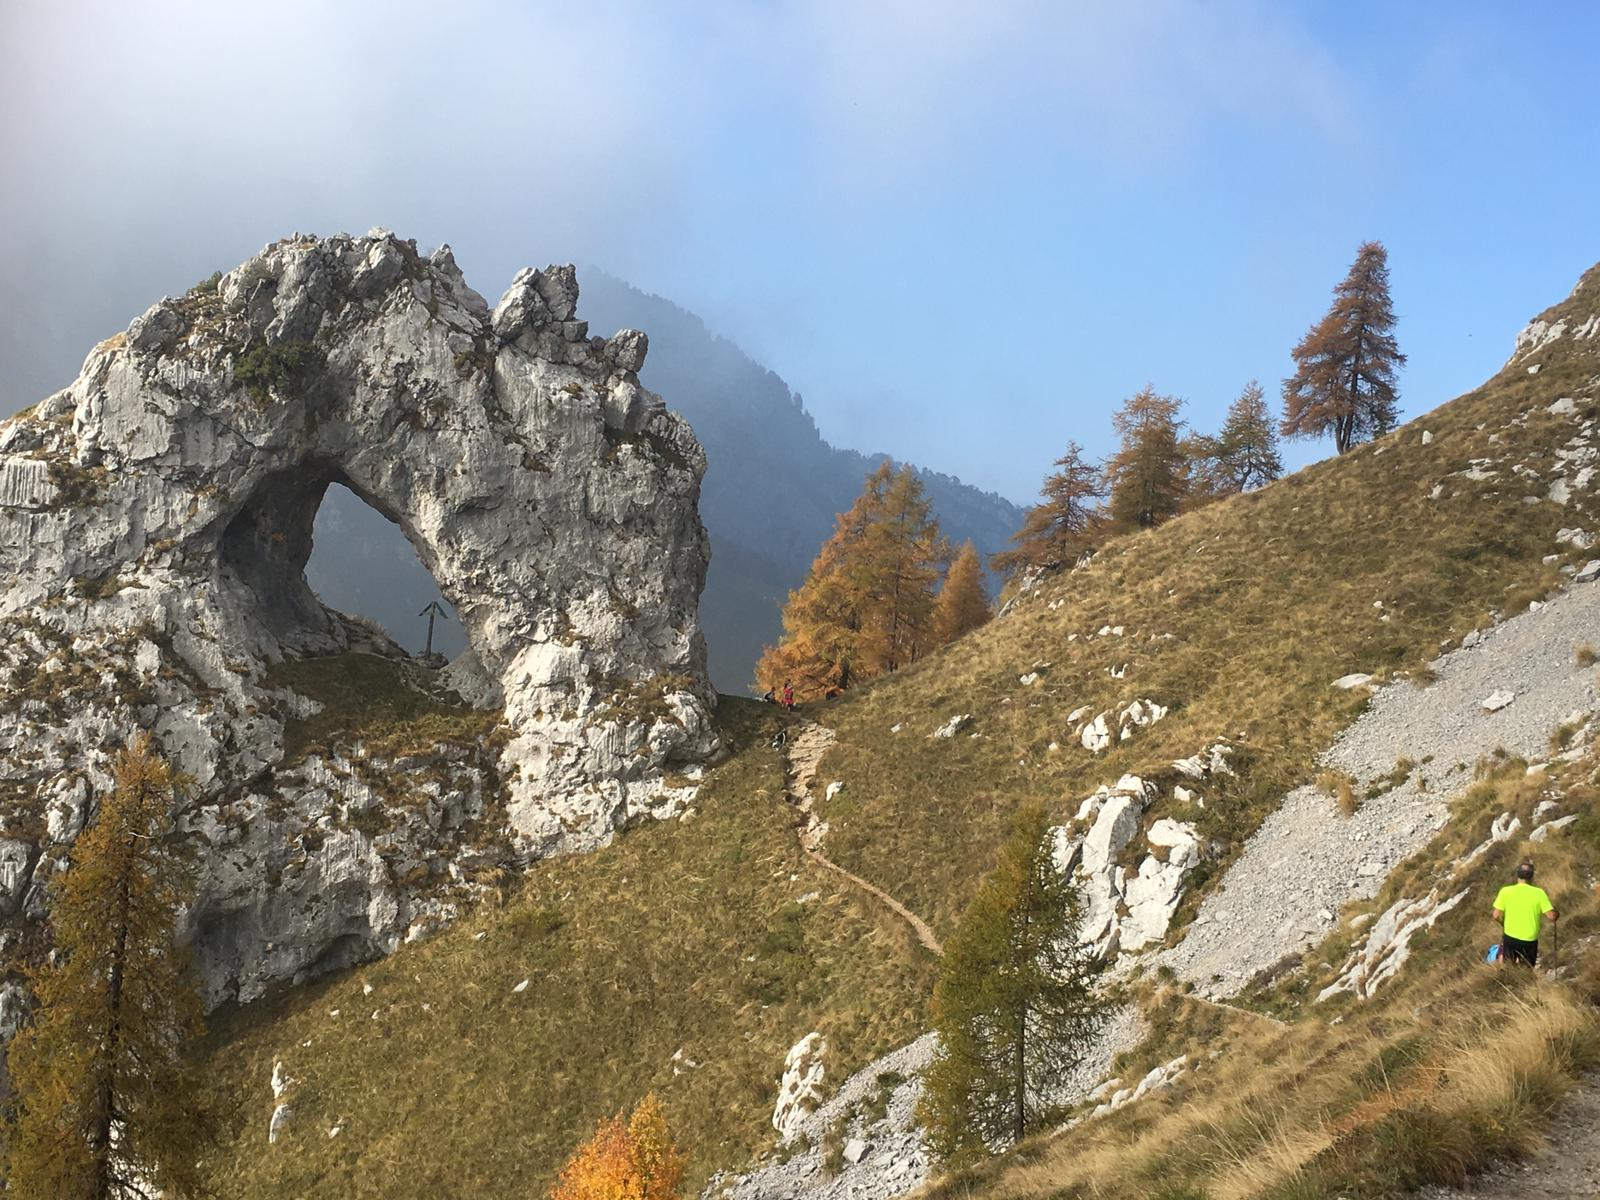 © www.pennaevaligia.it